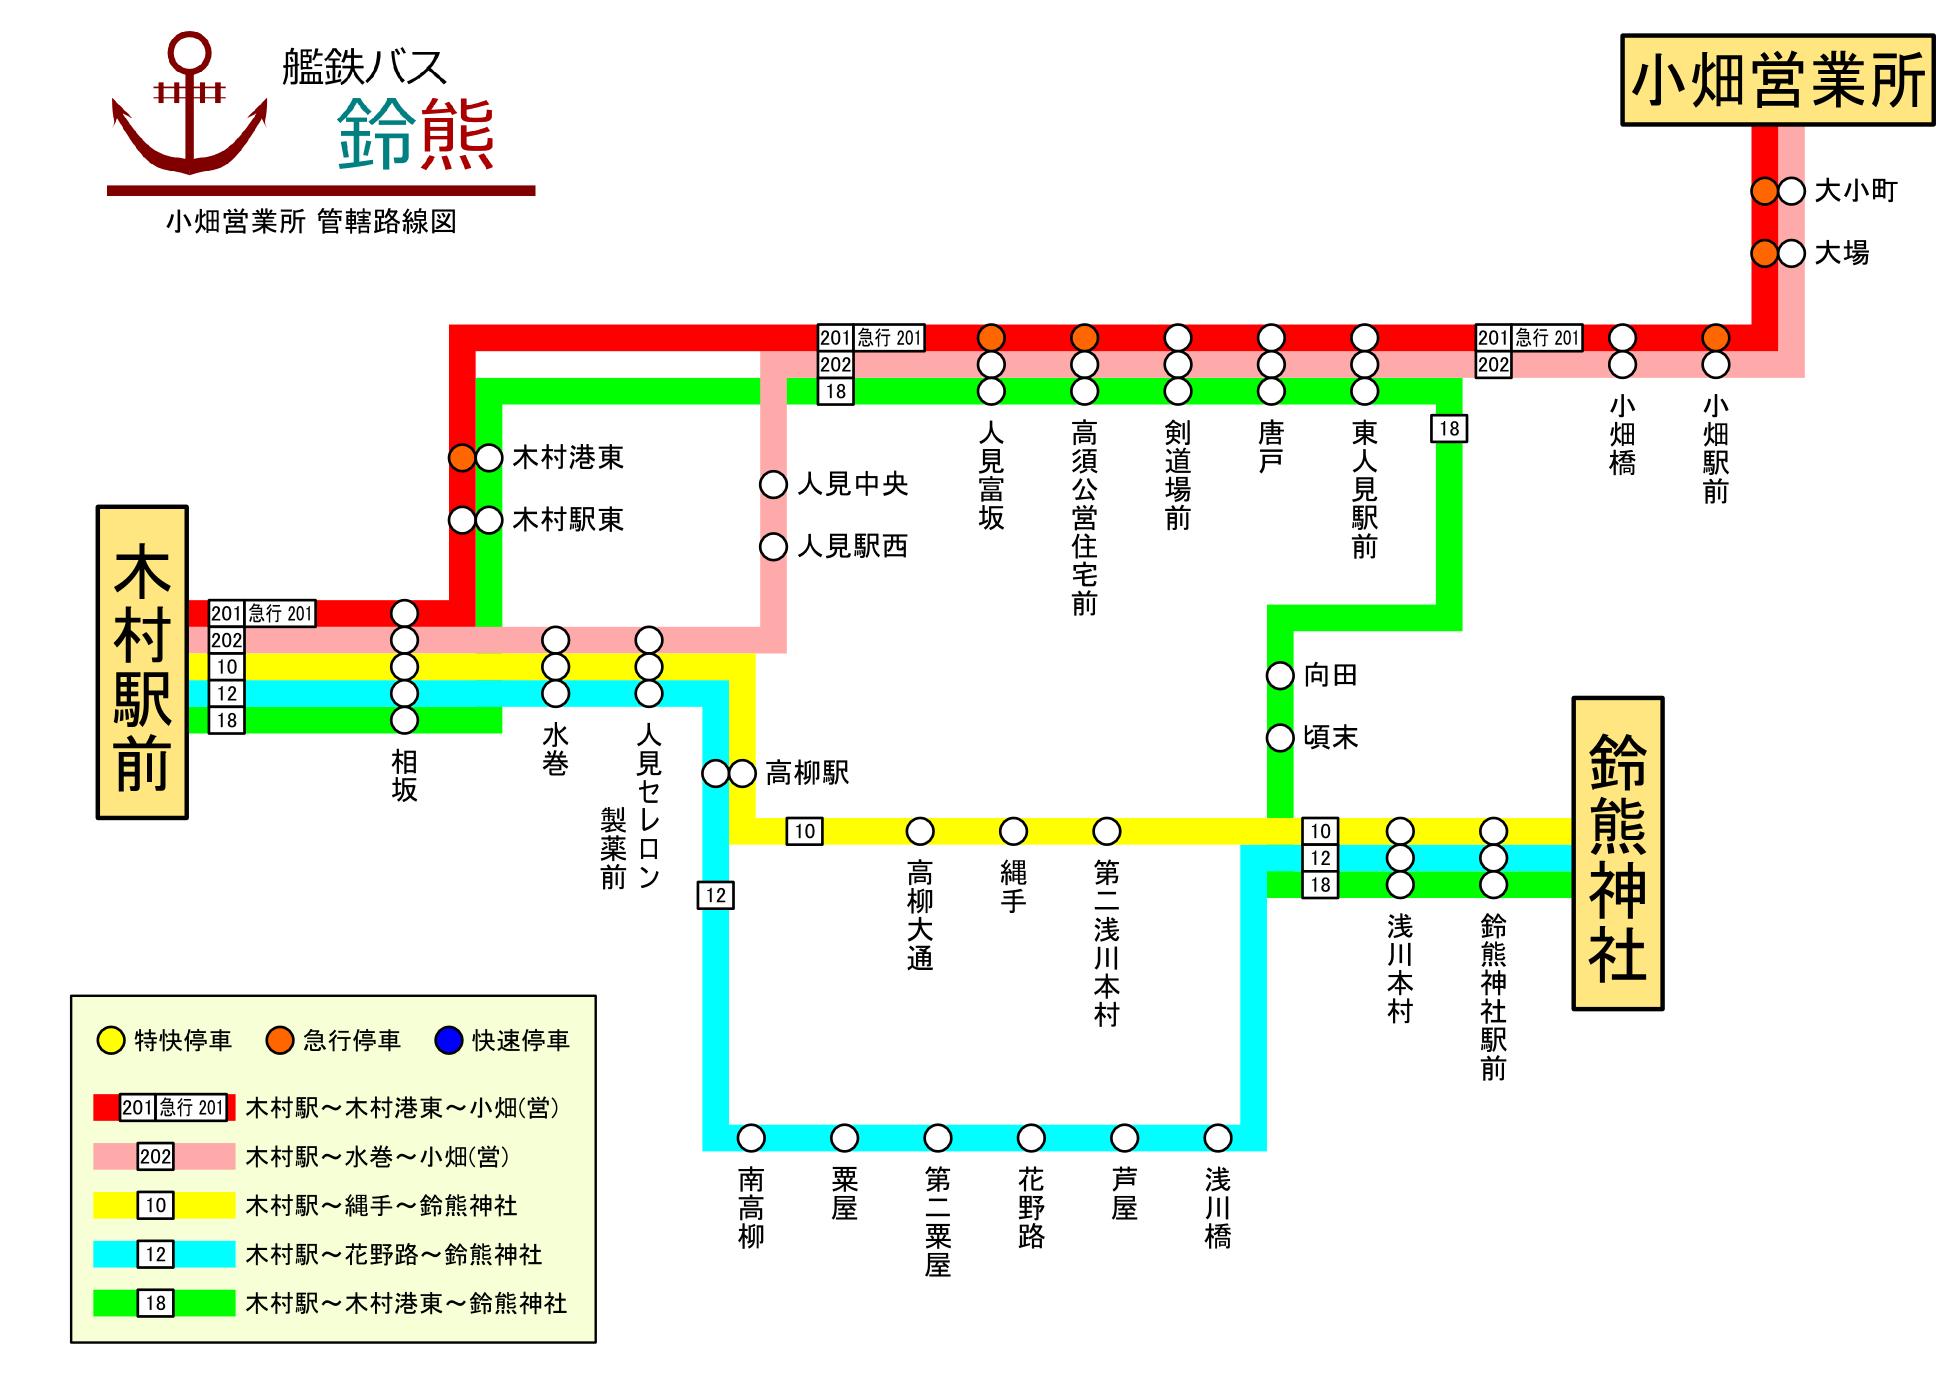 艦鉄バス 鈴熊路線図.png